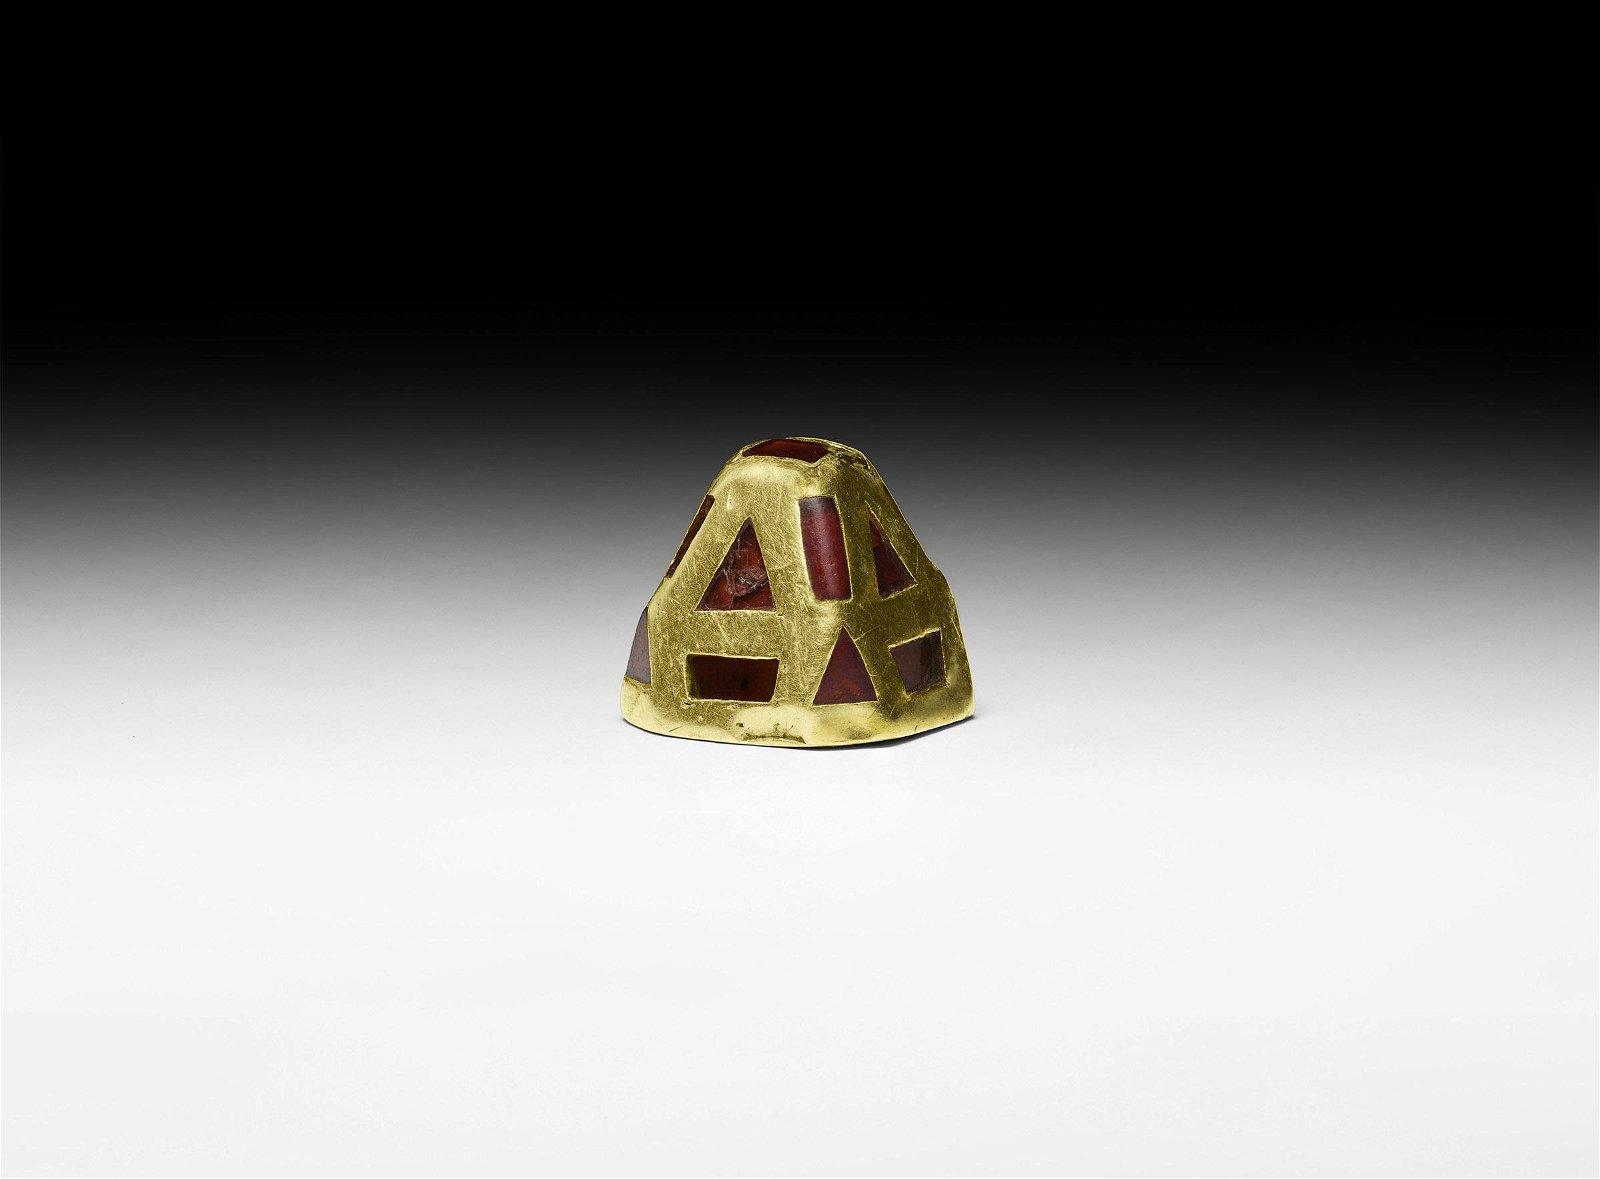 The Thwaite' Gold and Garnet Sword Pyramid